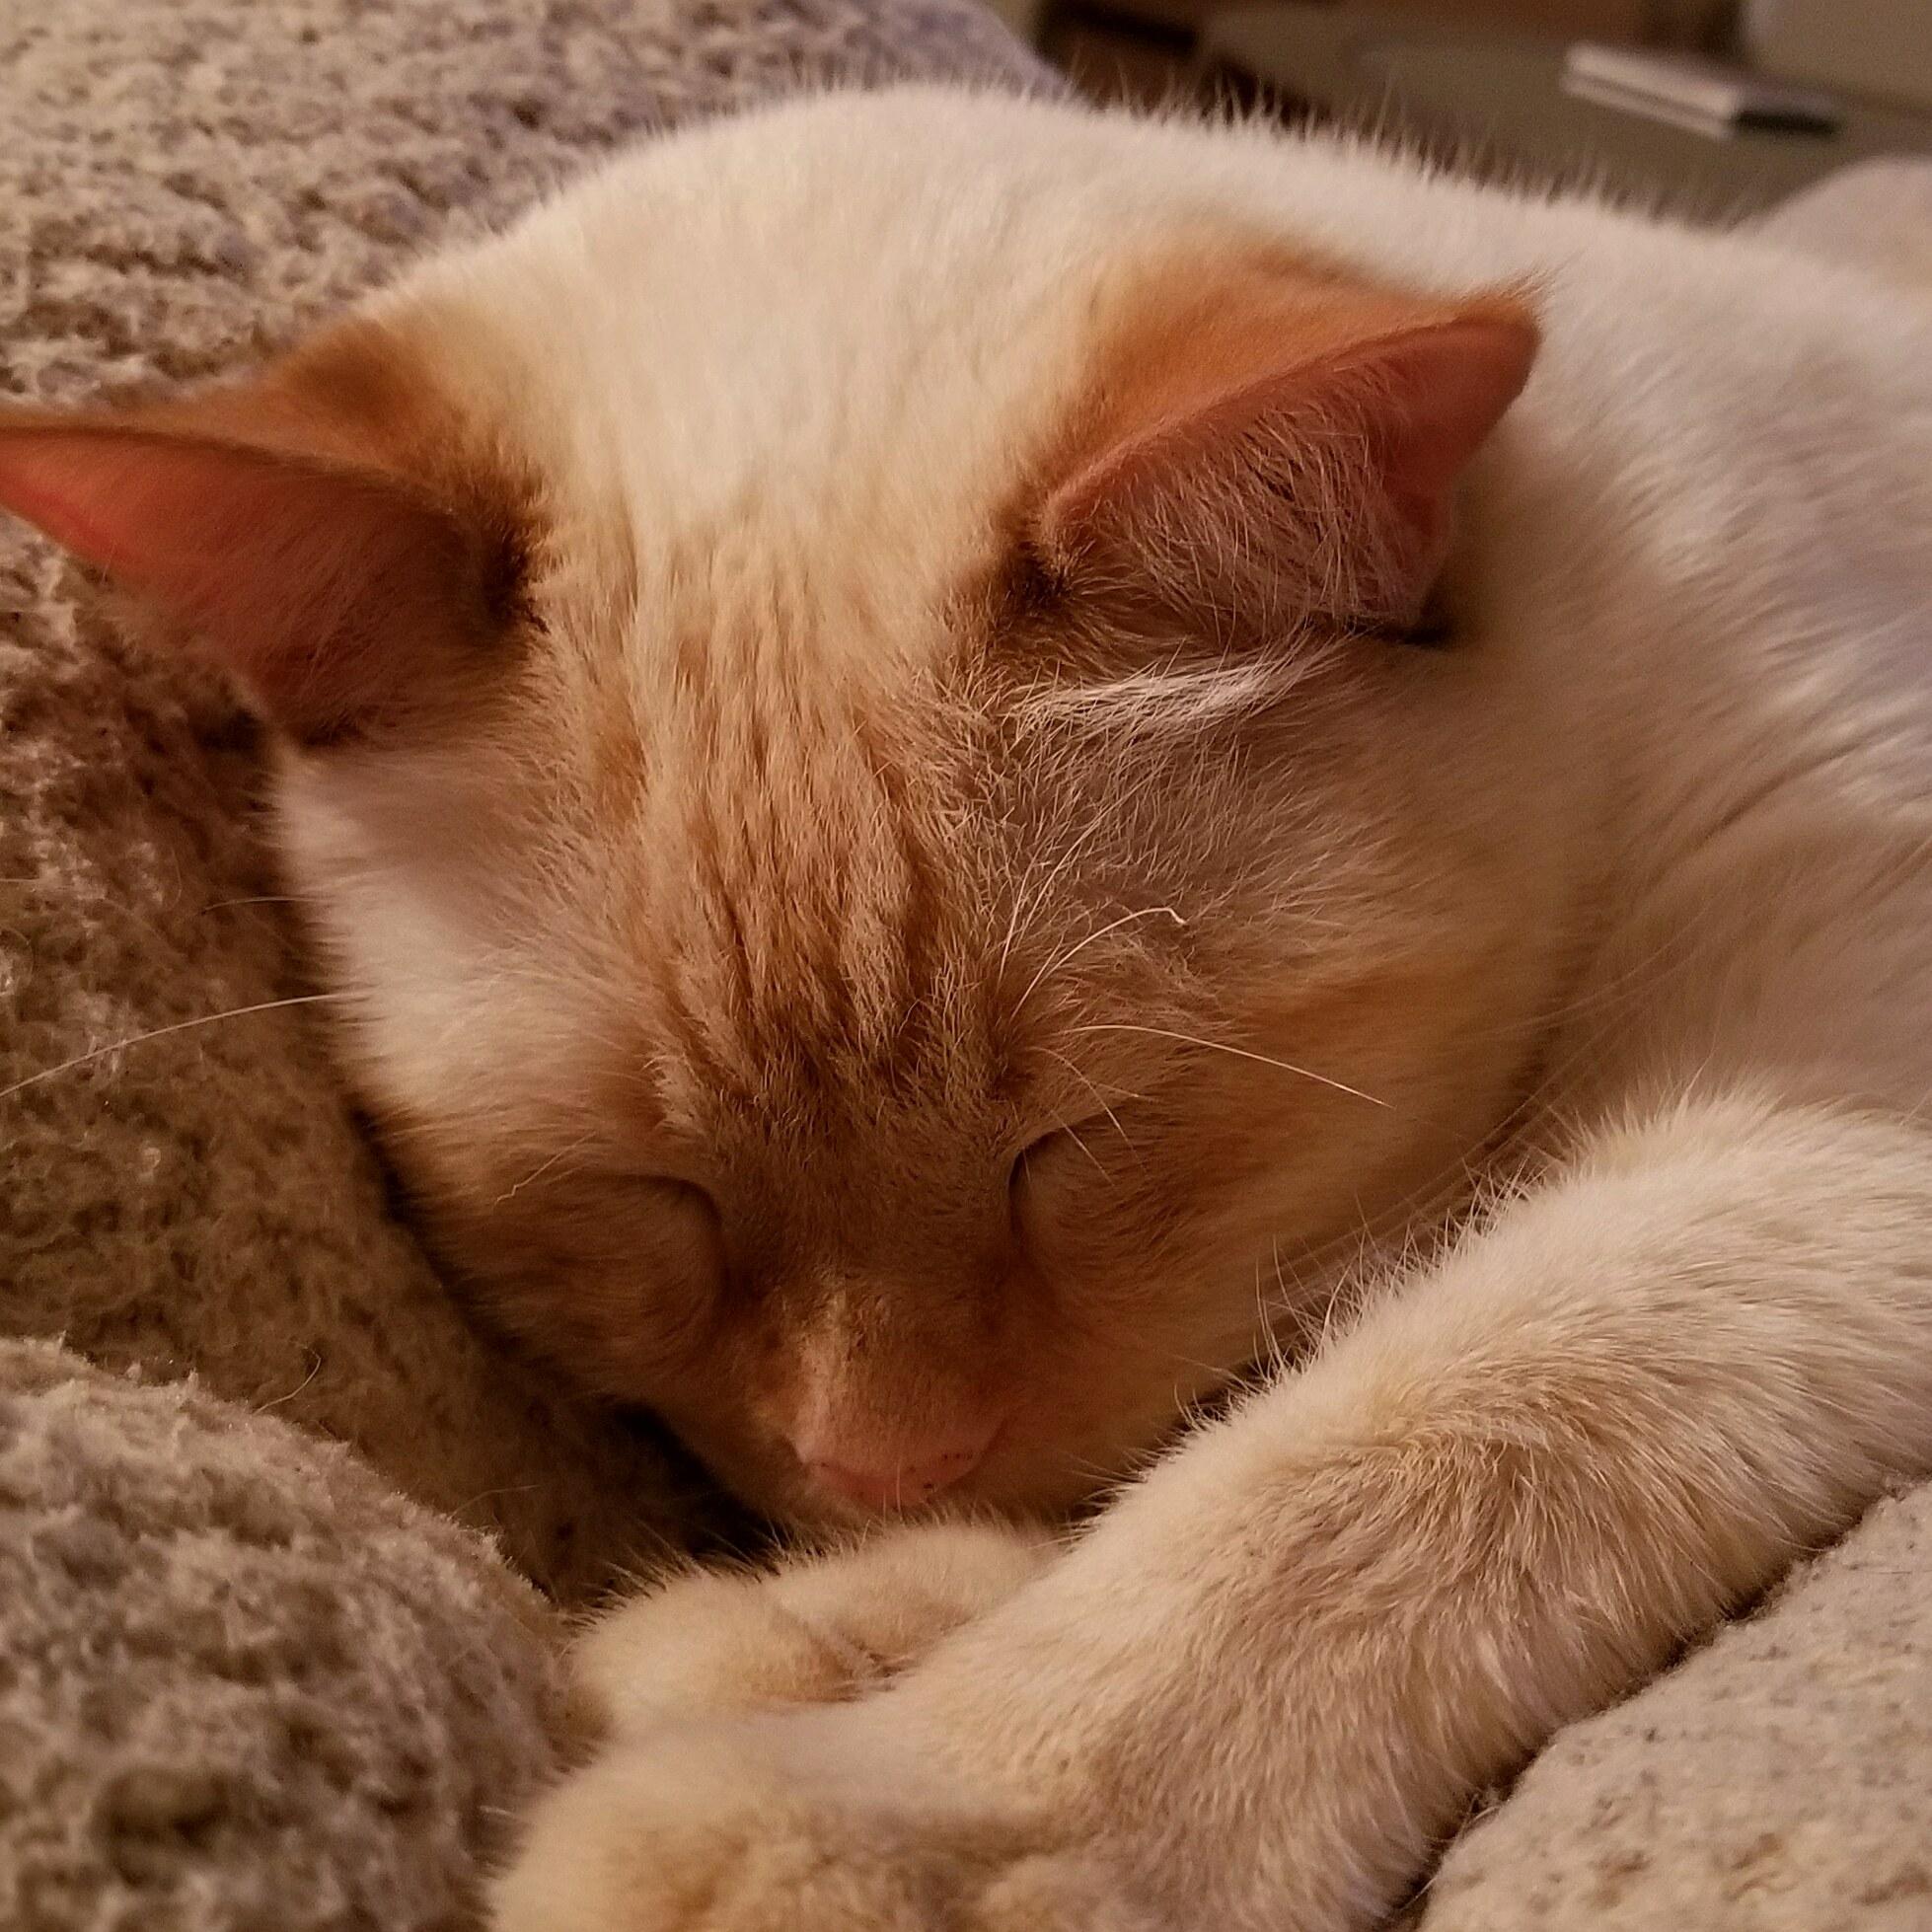 Mr. mouth enjoying his kush cat life